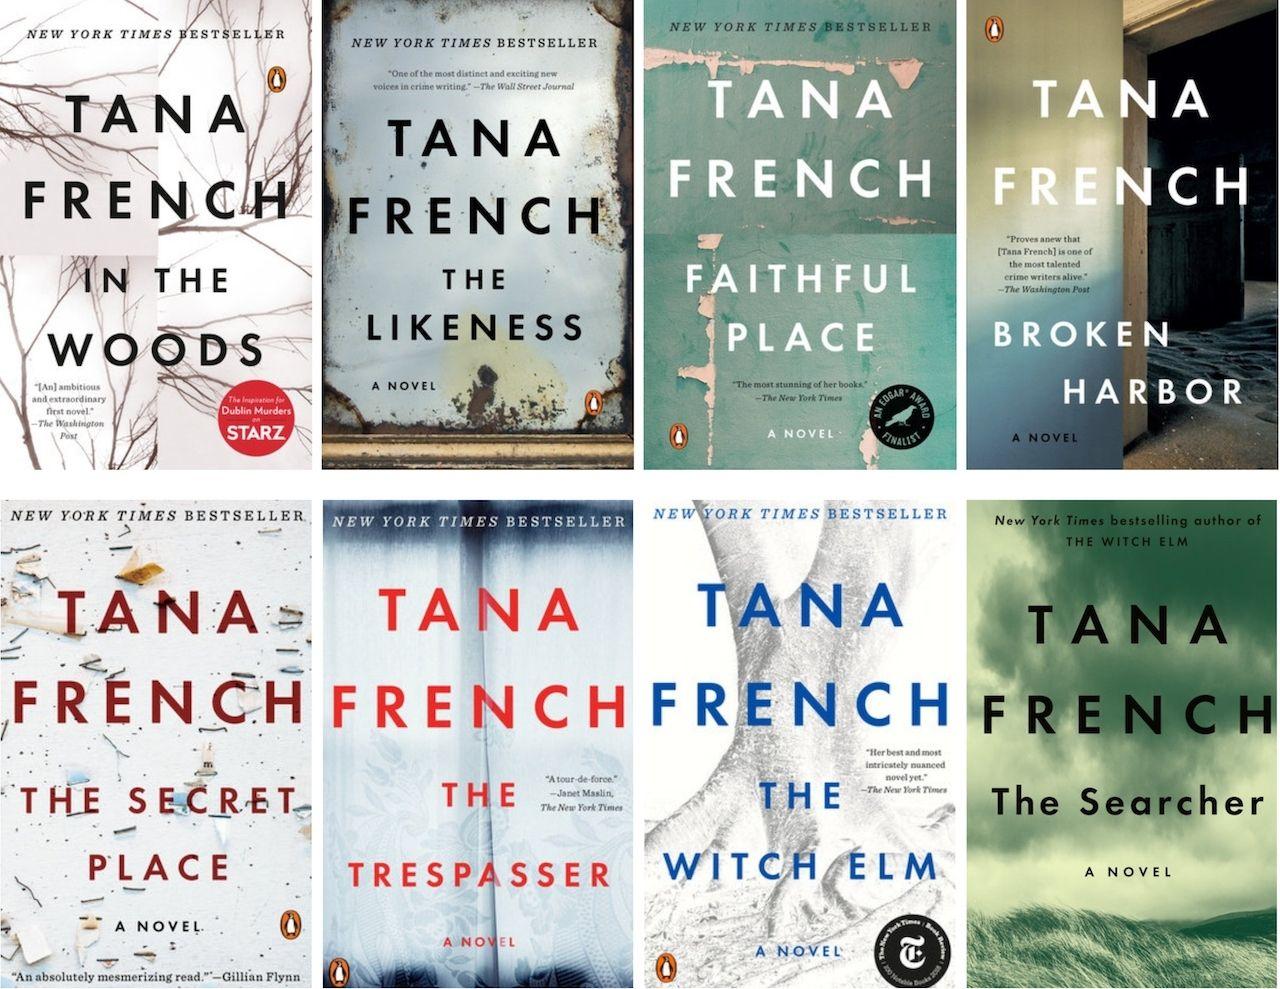 Tana French novels